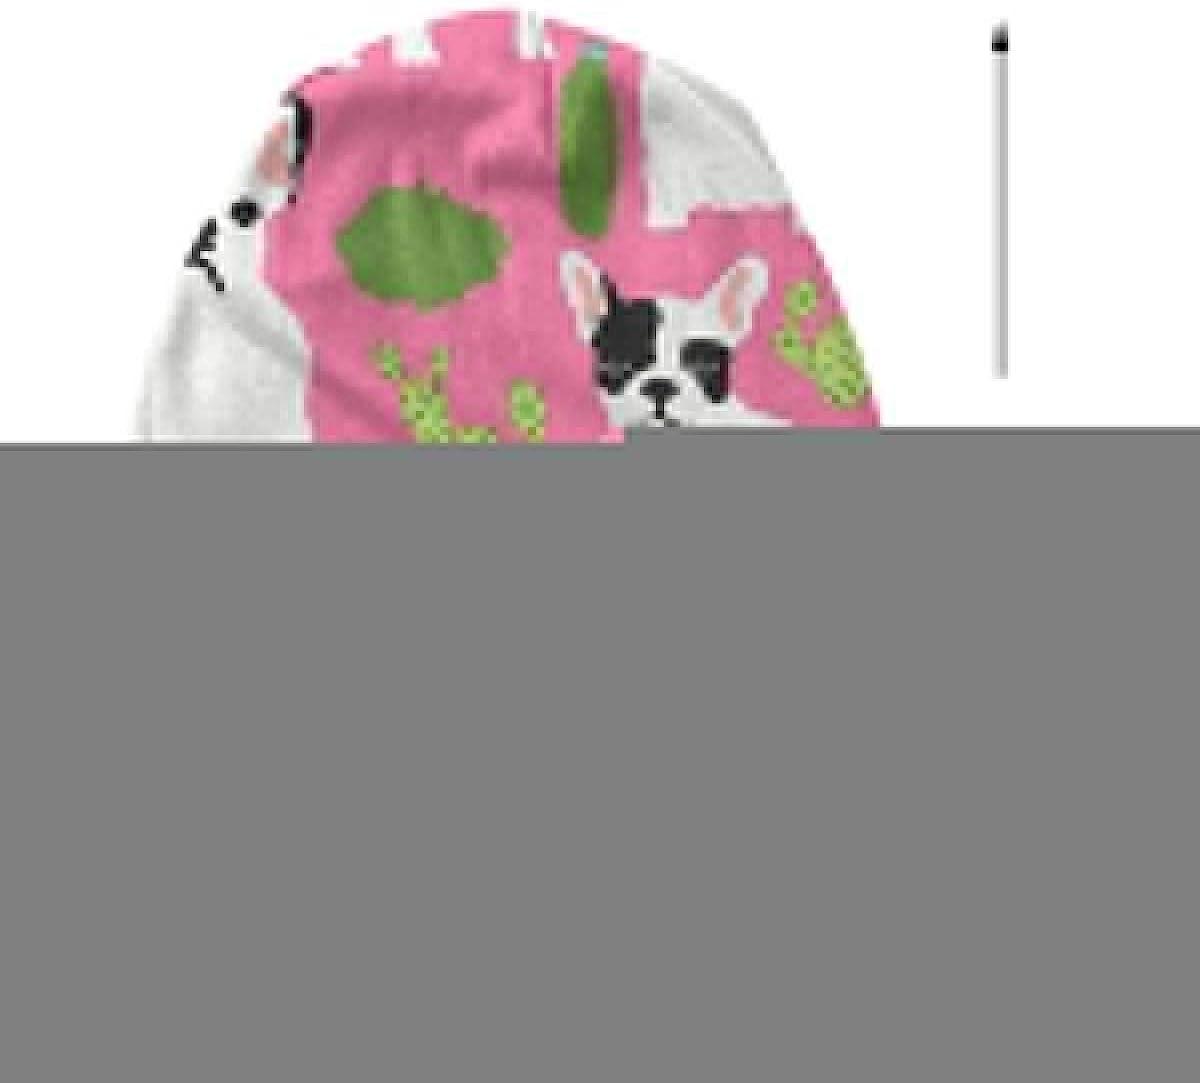 HHTZTCL Cute French Bulldog and Cactus Mens Womens Winter Beanies Knit Hat Stretch Skull Cap Black